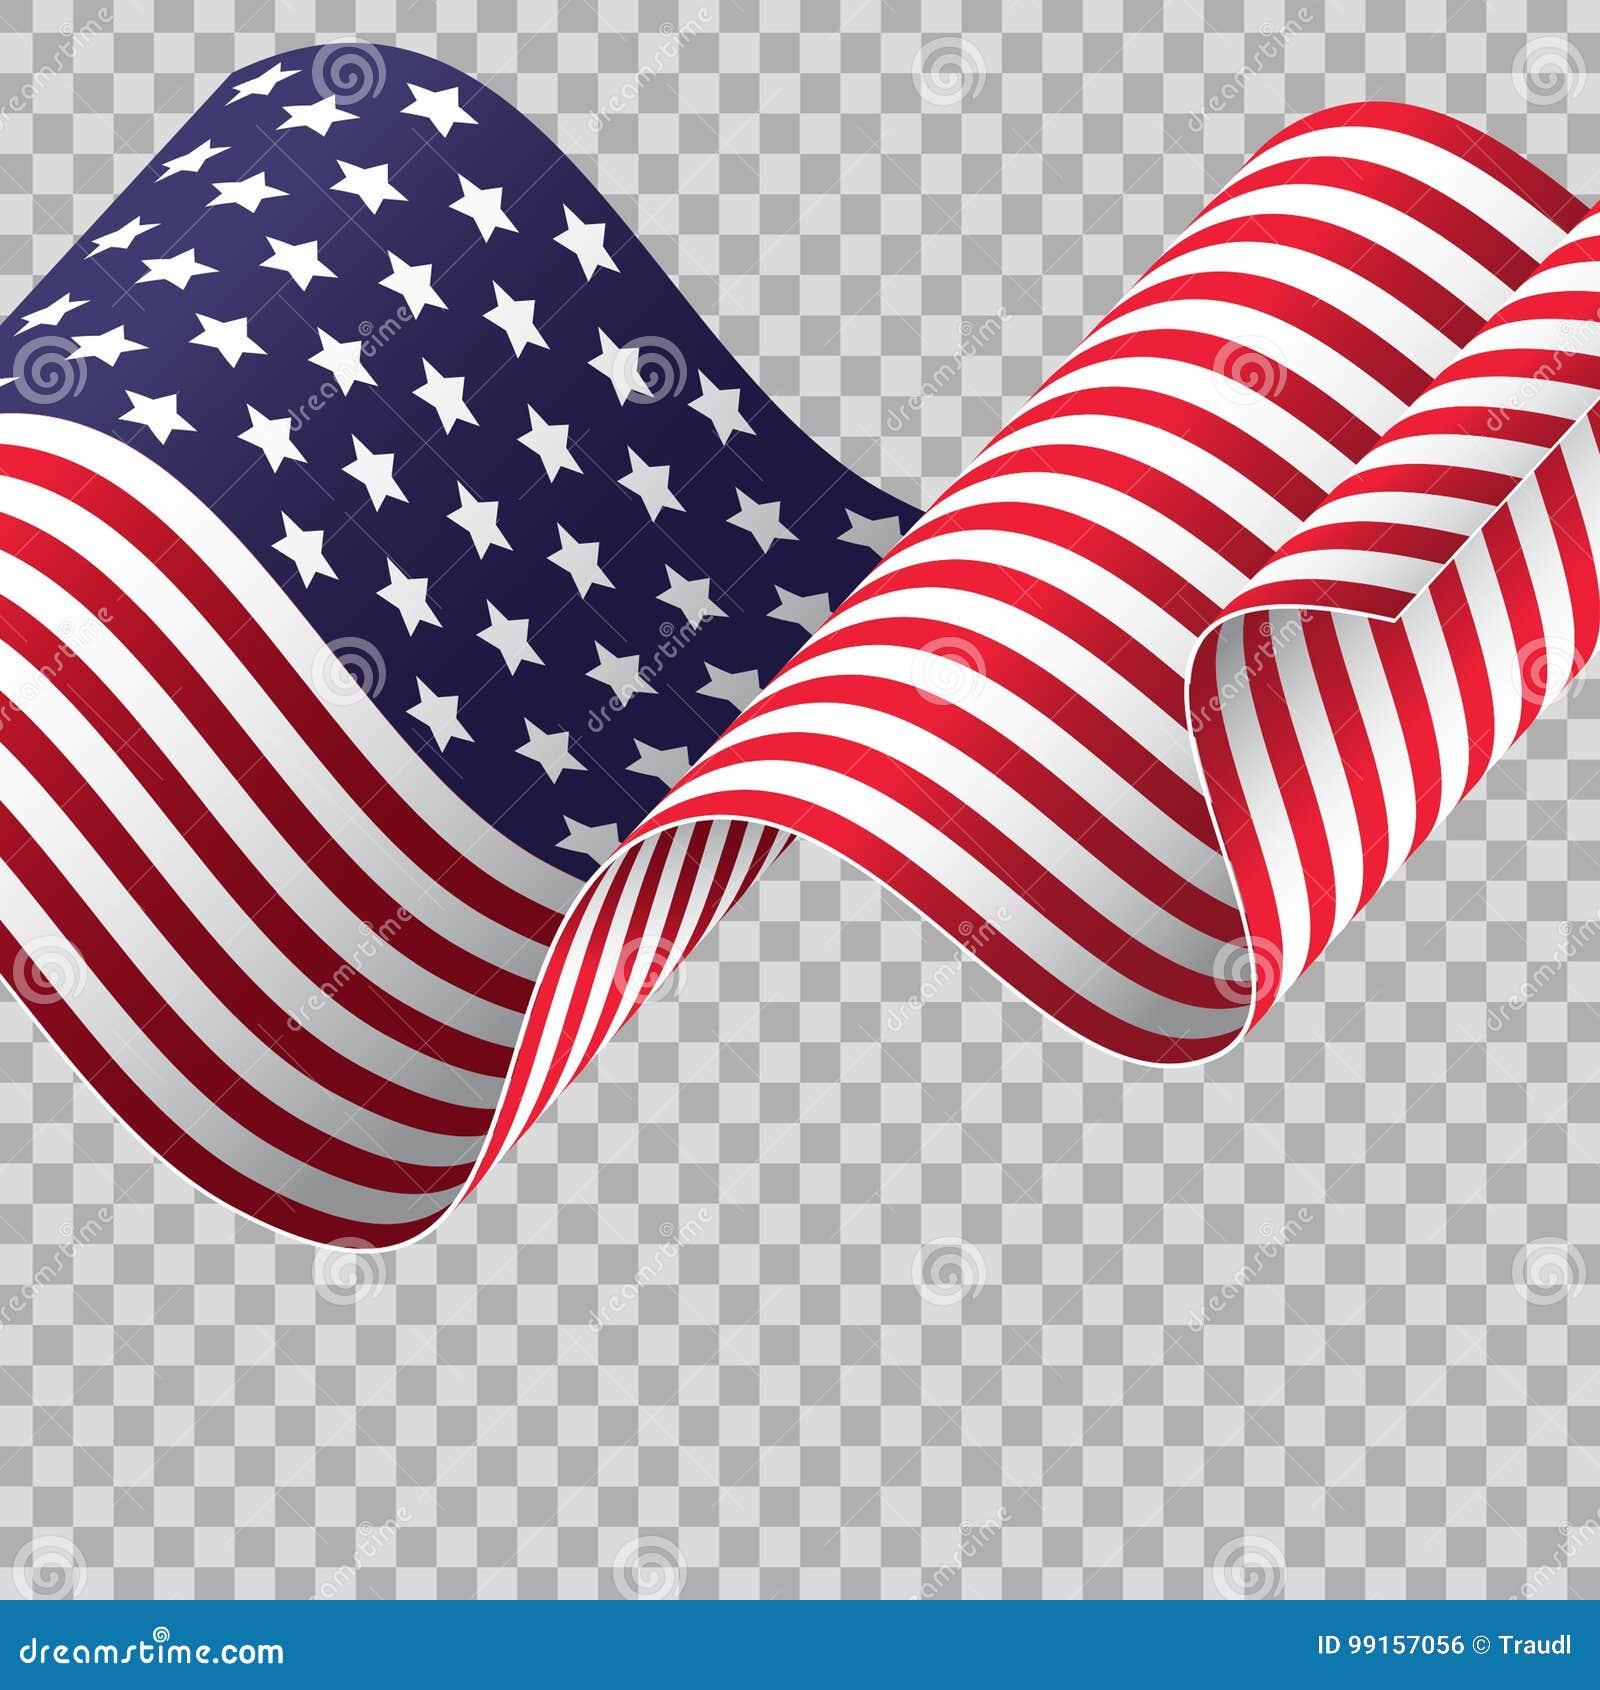 american flag stock vector illustration of glory flag 99157056 rh dreamstime com Cartoon Bow Ties Fun Bow Ties